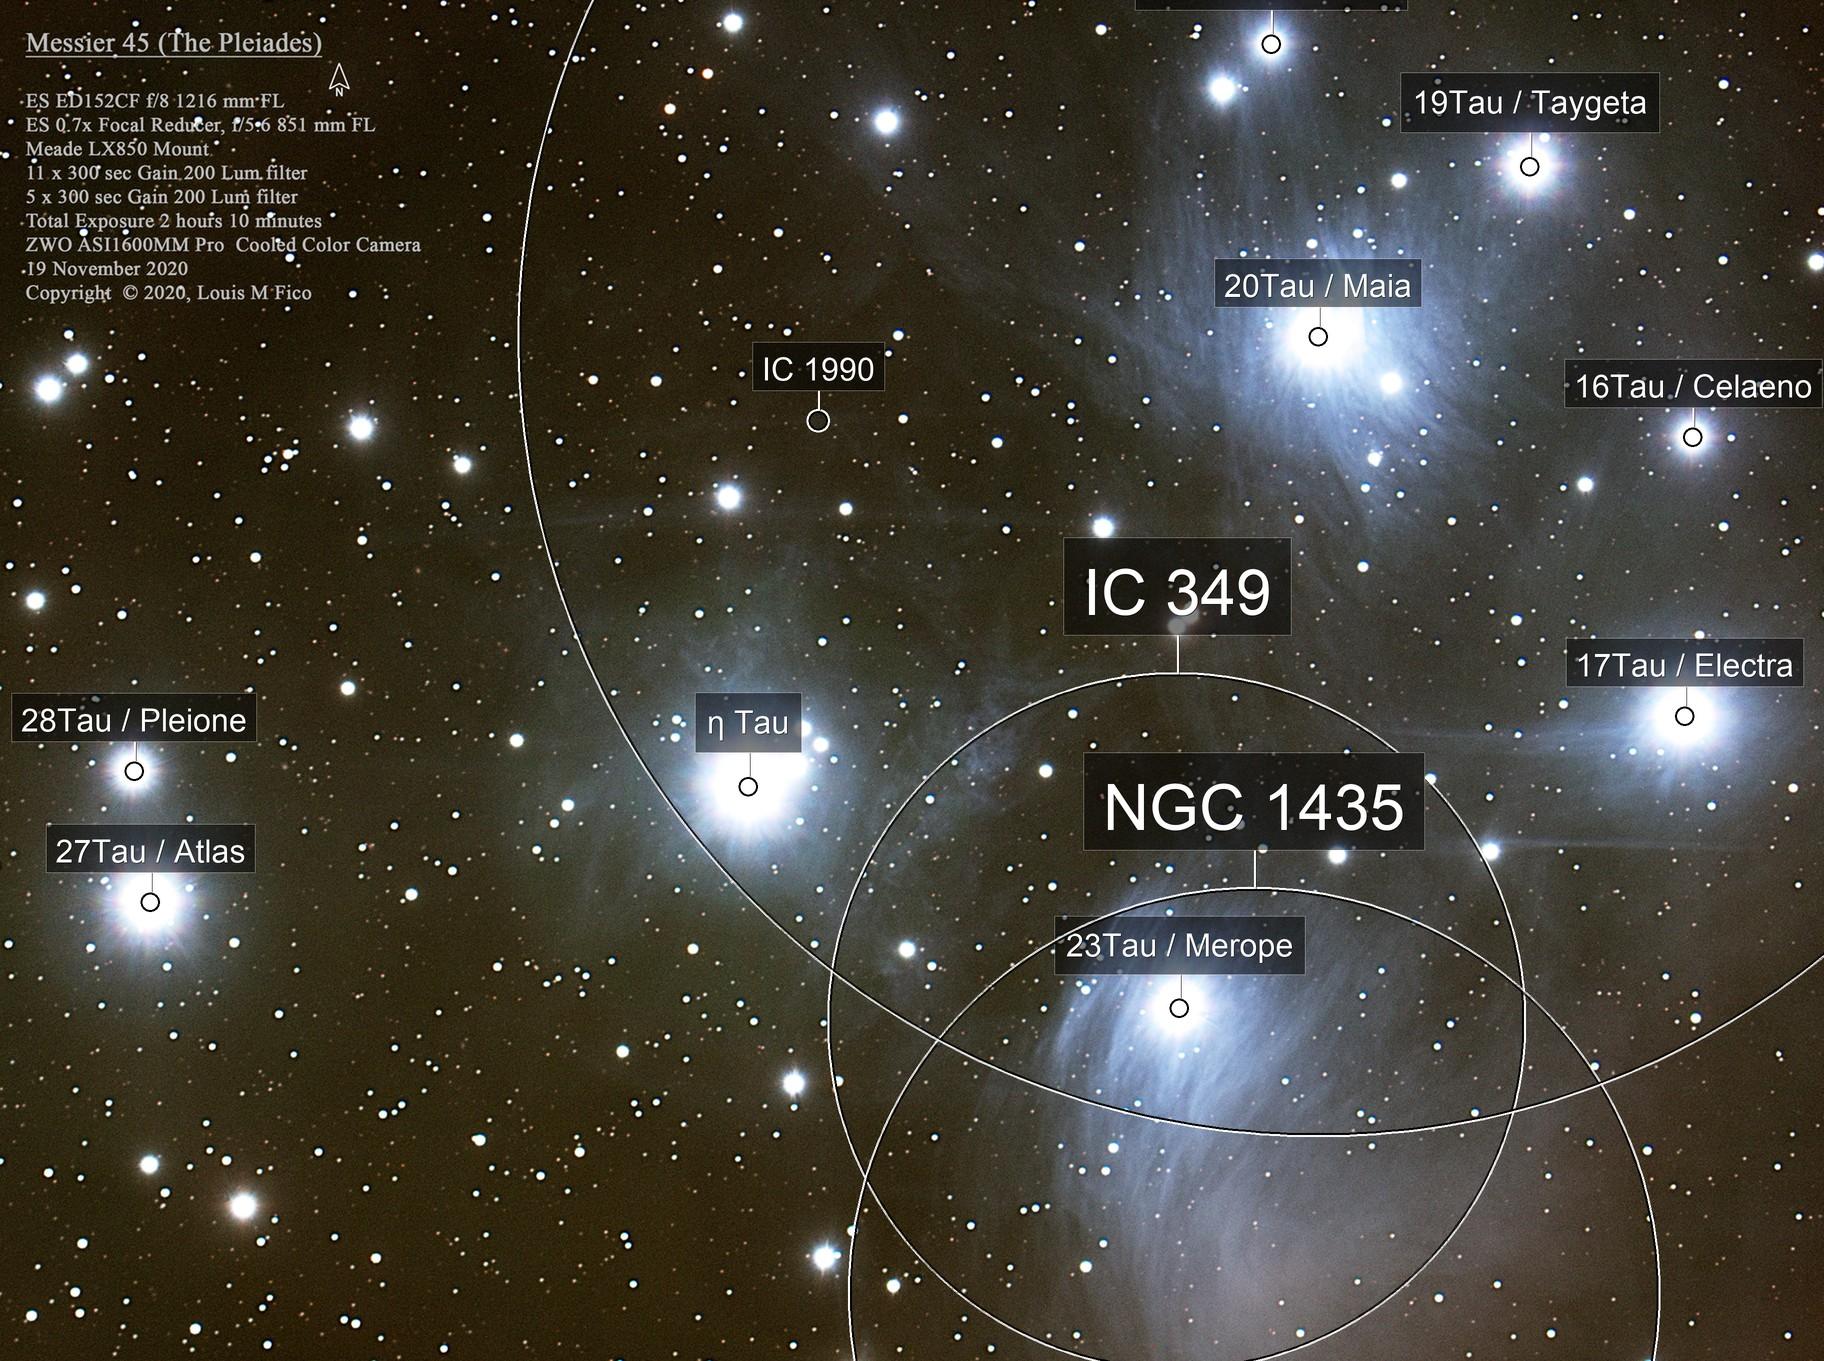 Messier 45 (The Pleiades)